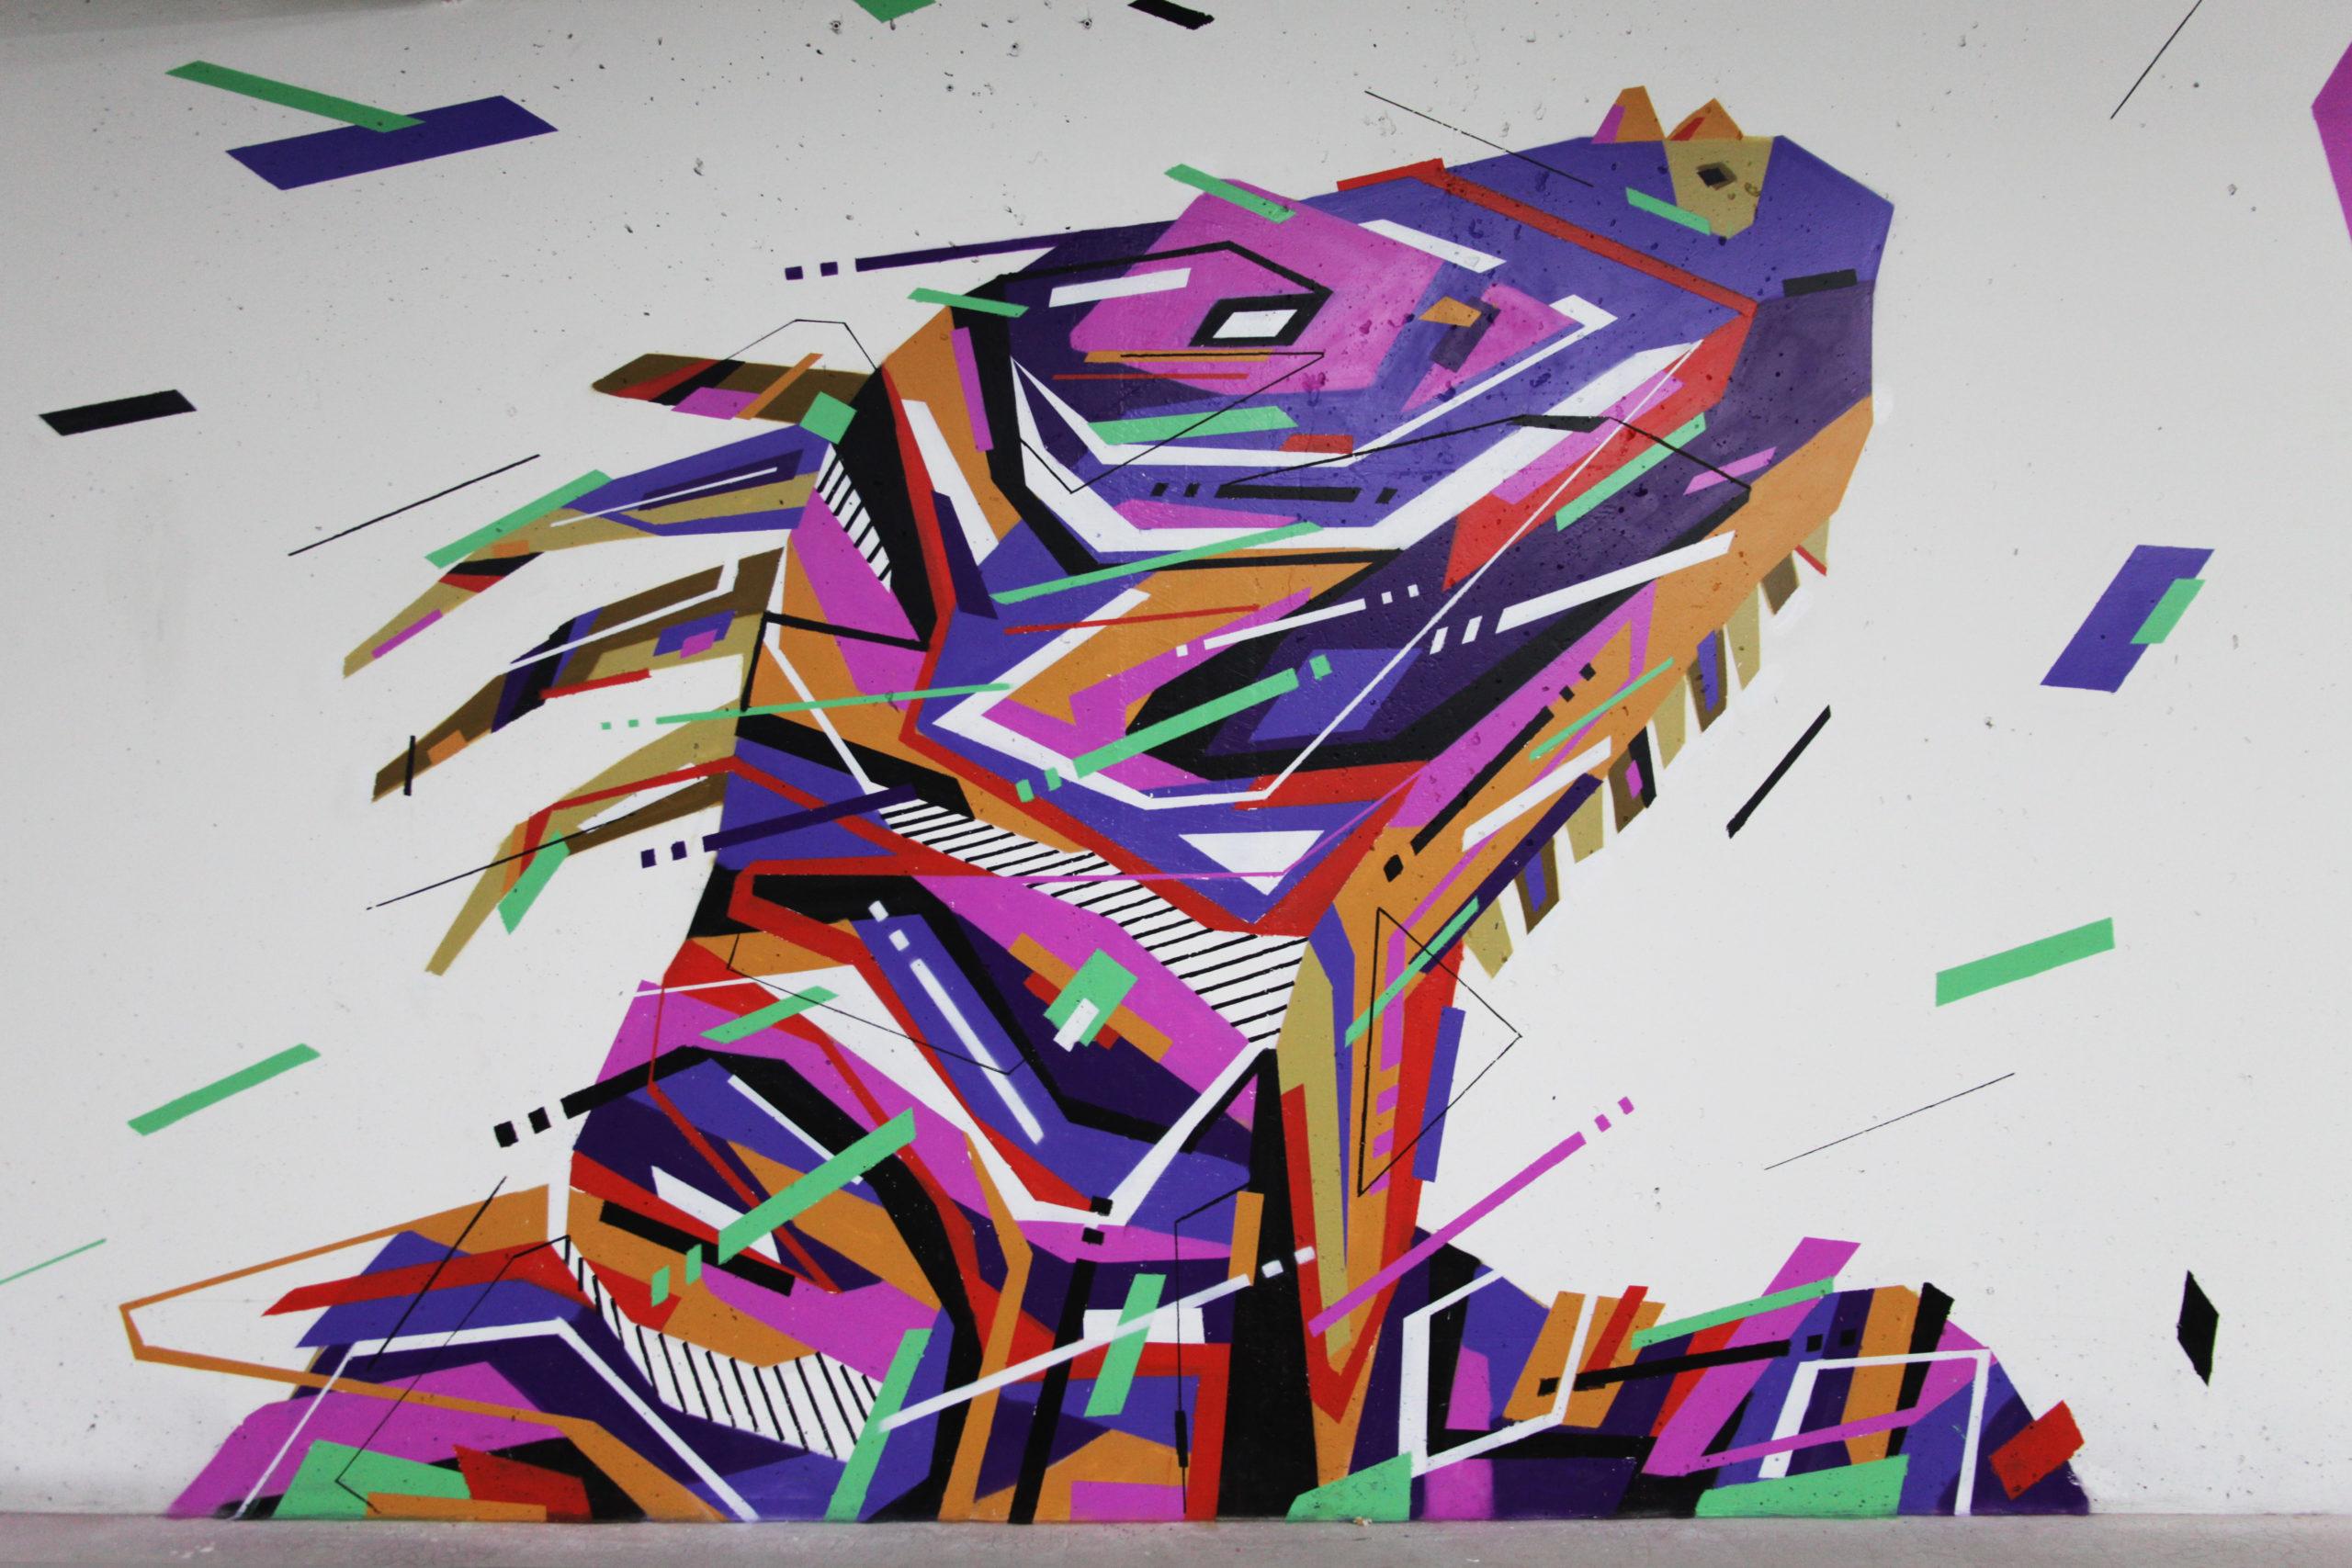 Fresque Graffaune Graffiti iguane réalisée par Daco